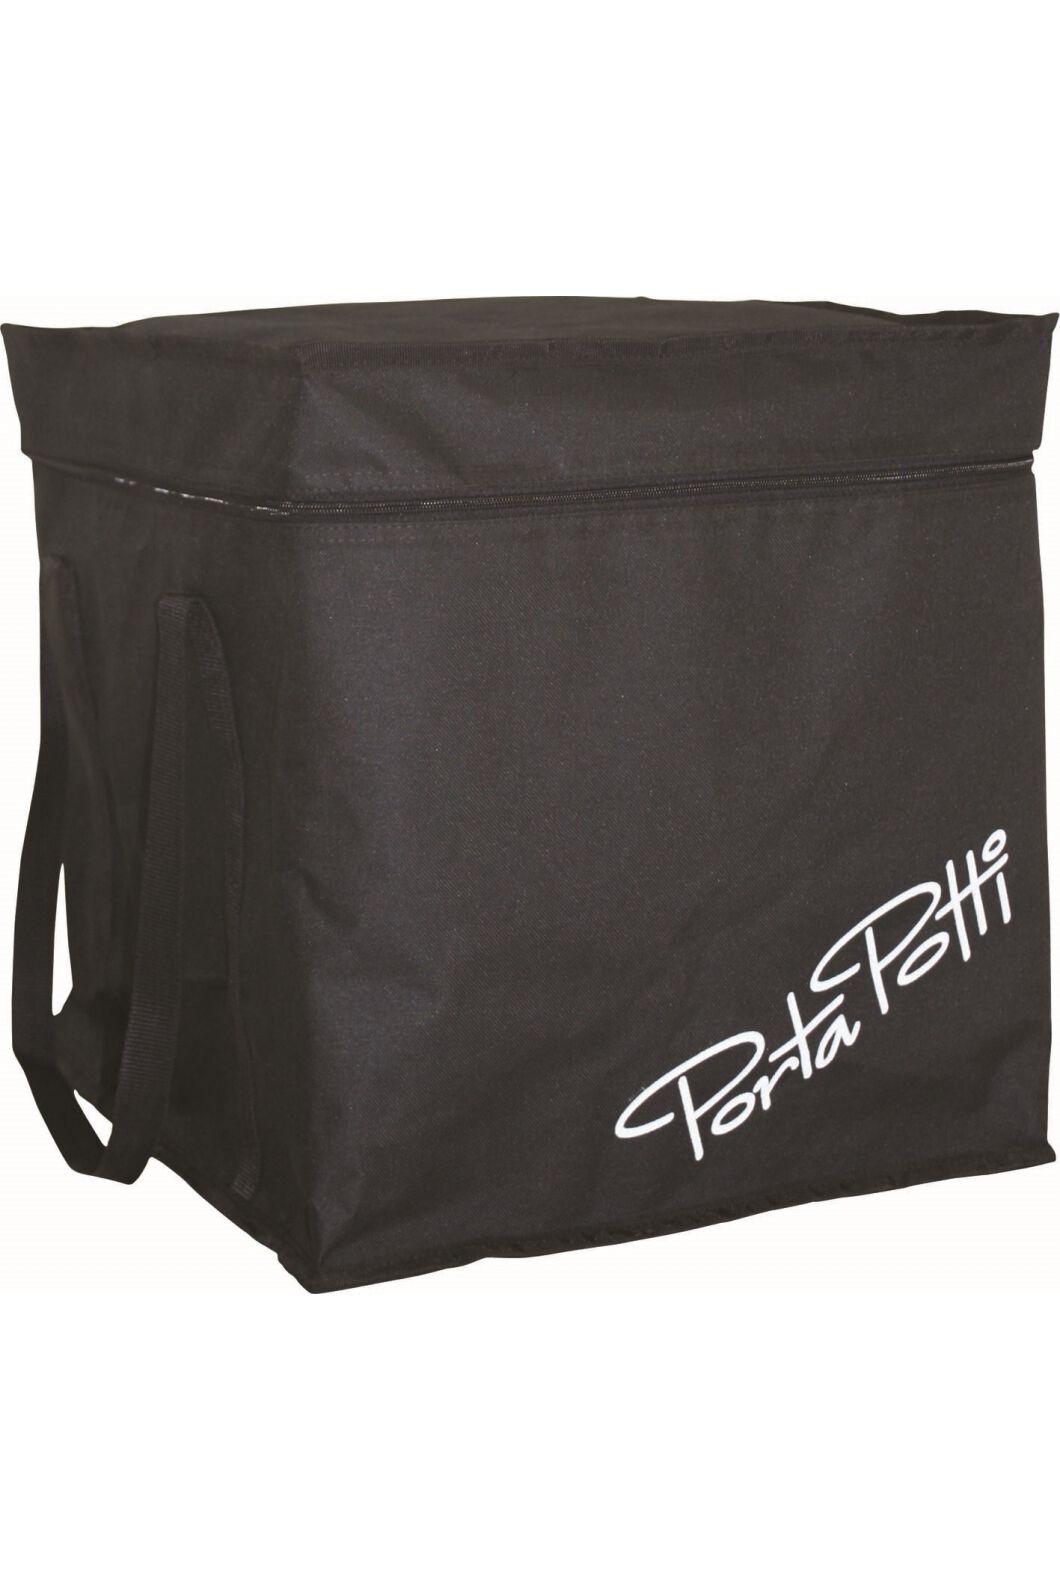 Thetford Porta Potti Toilet Carry Bag, None, hi-res